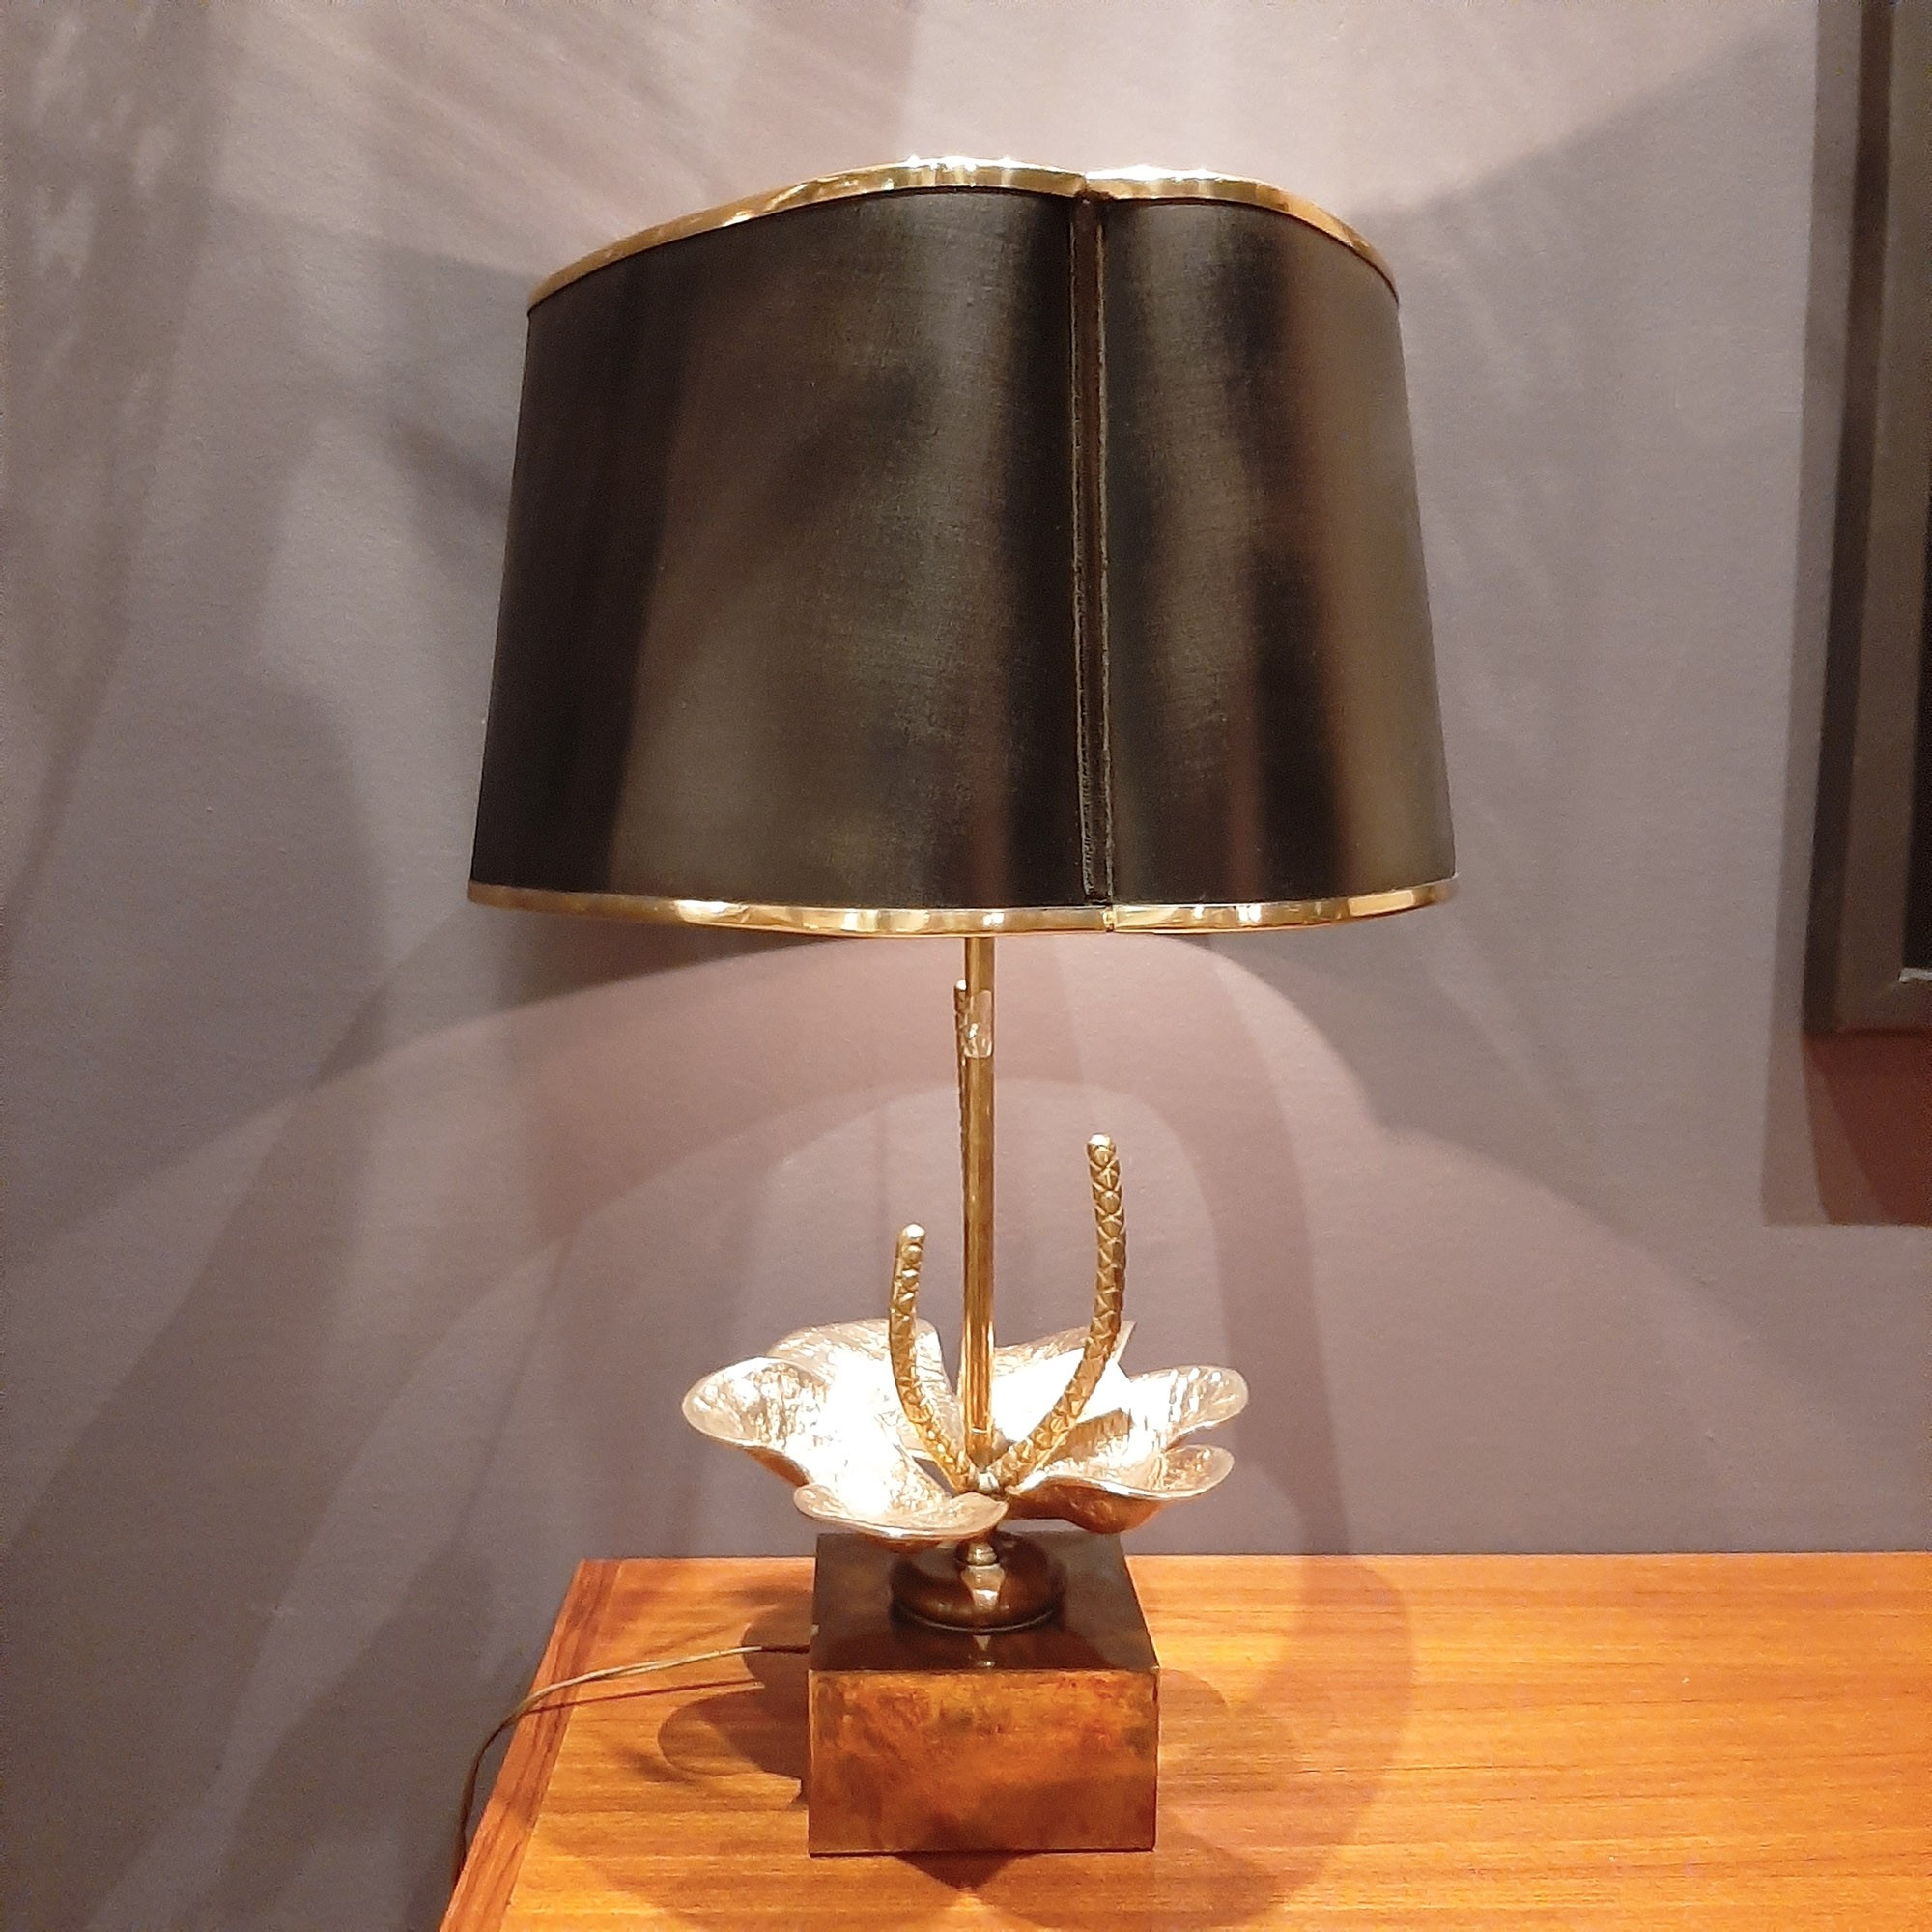 Maison Charles tafellamp '60